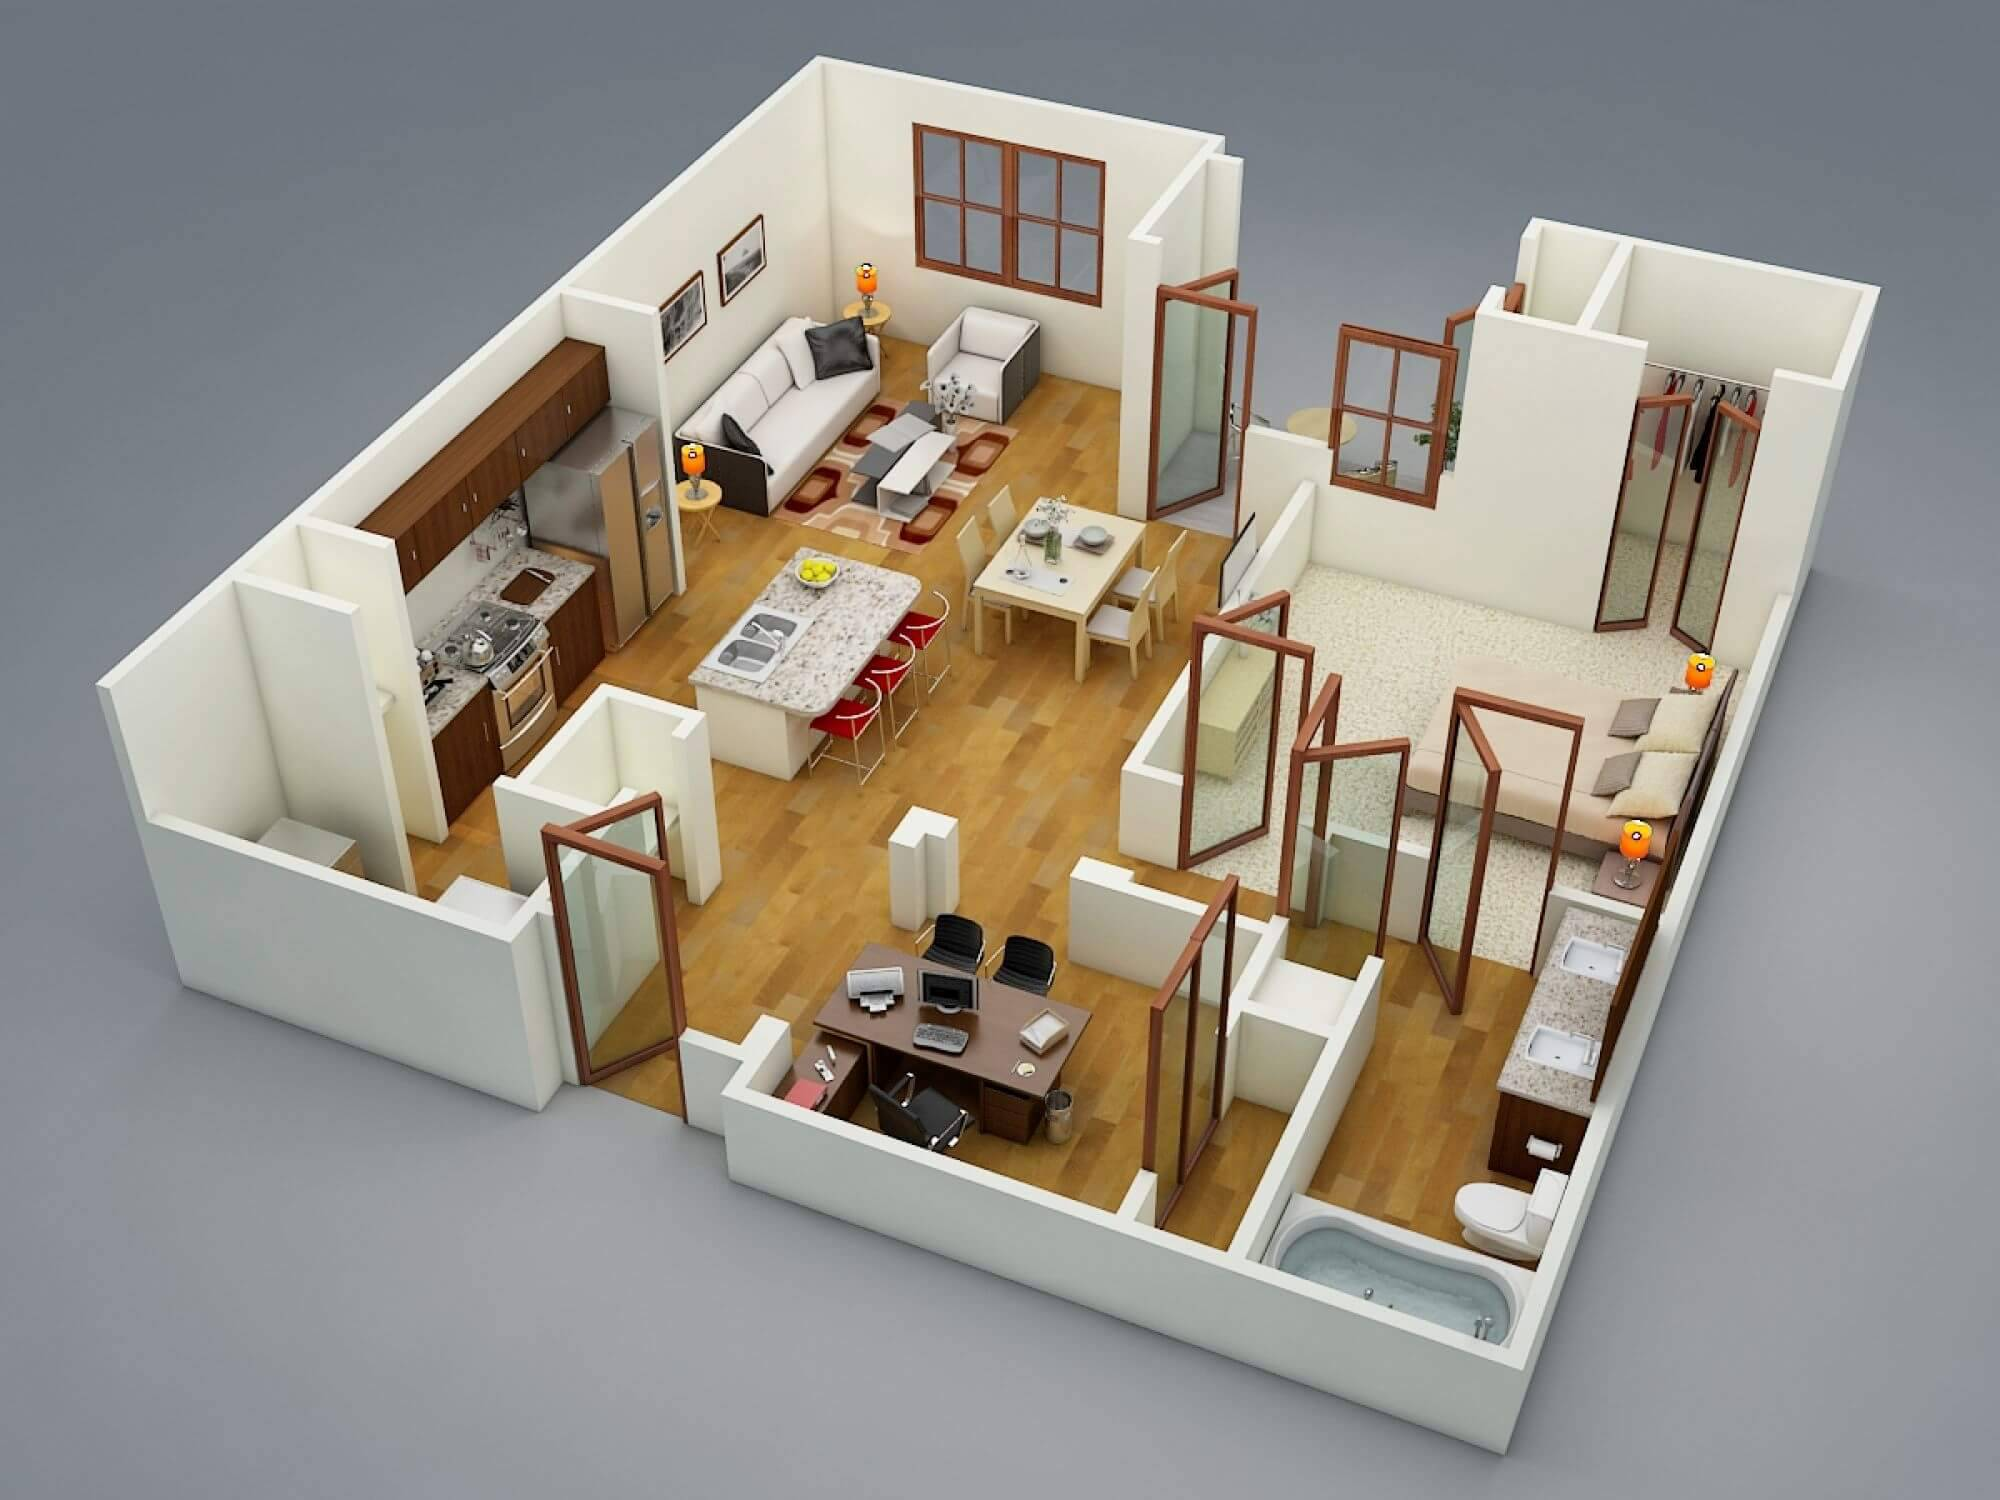 50 inspira es de plantas de casas para seu projeto for 10 meter frontage home designs